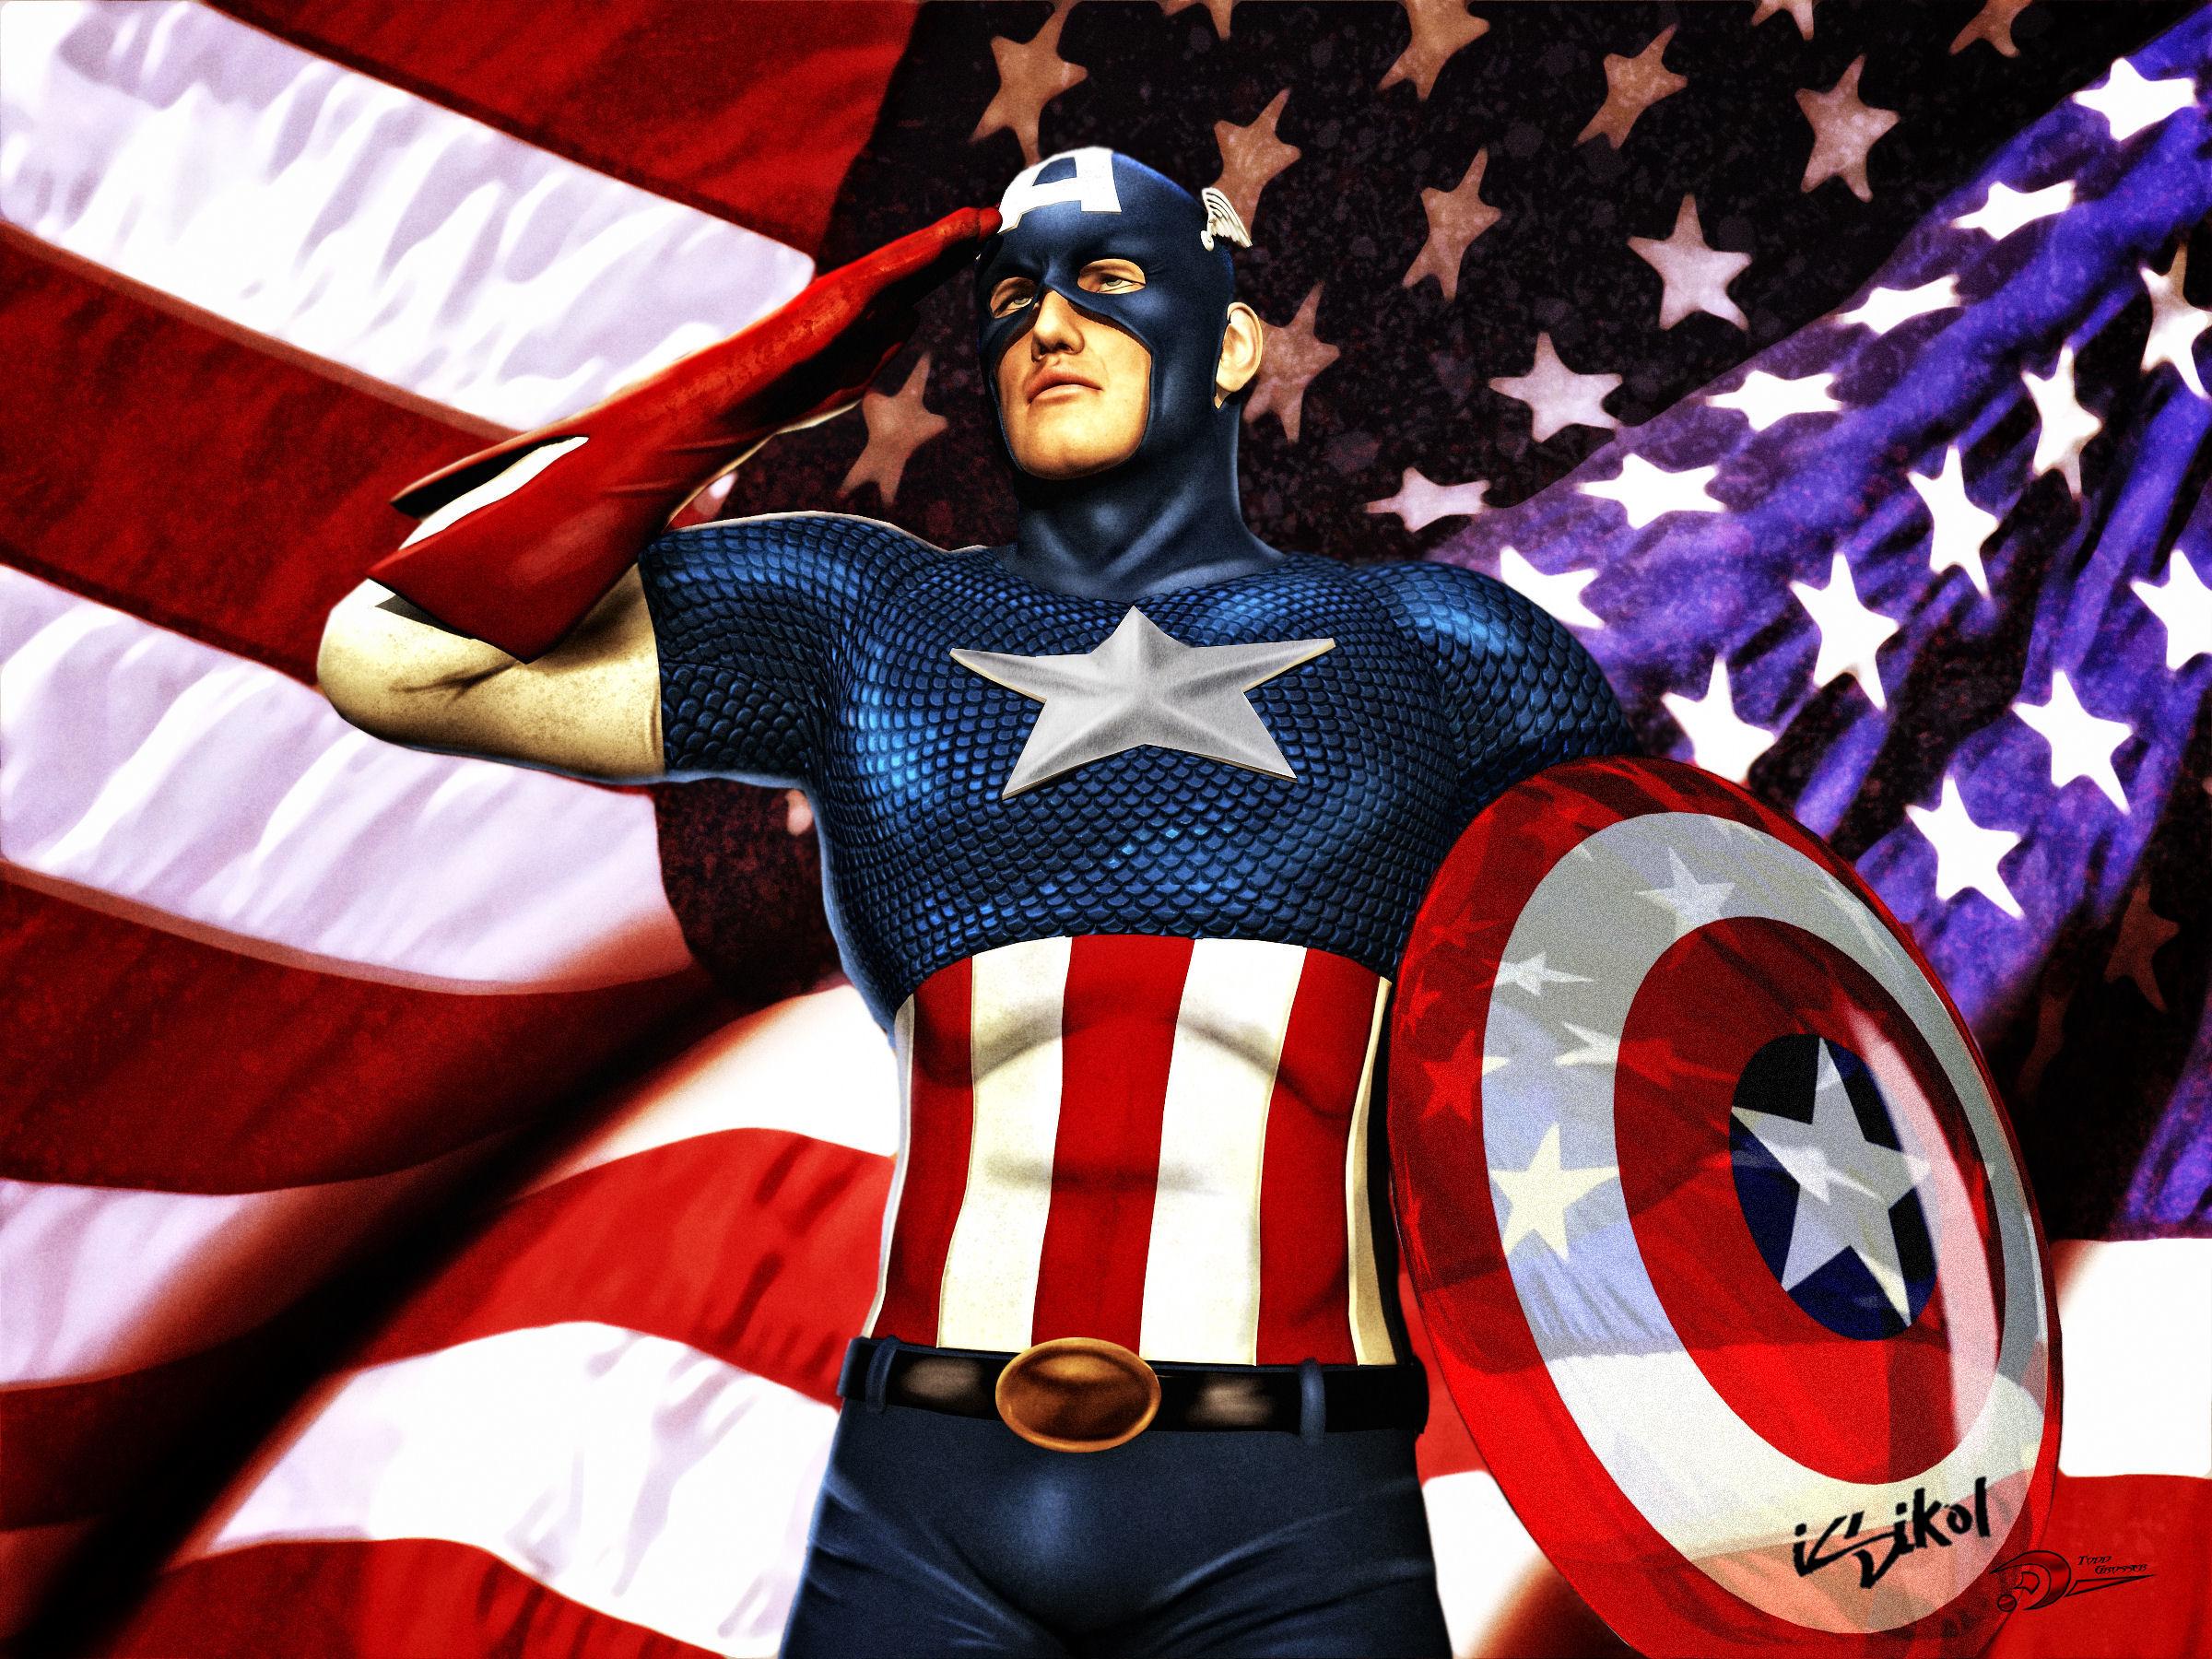 Captain america hd wallpaper background image 2400x1800 id 402964 wallpaper abyss - Image captain america ...